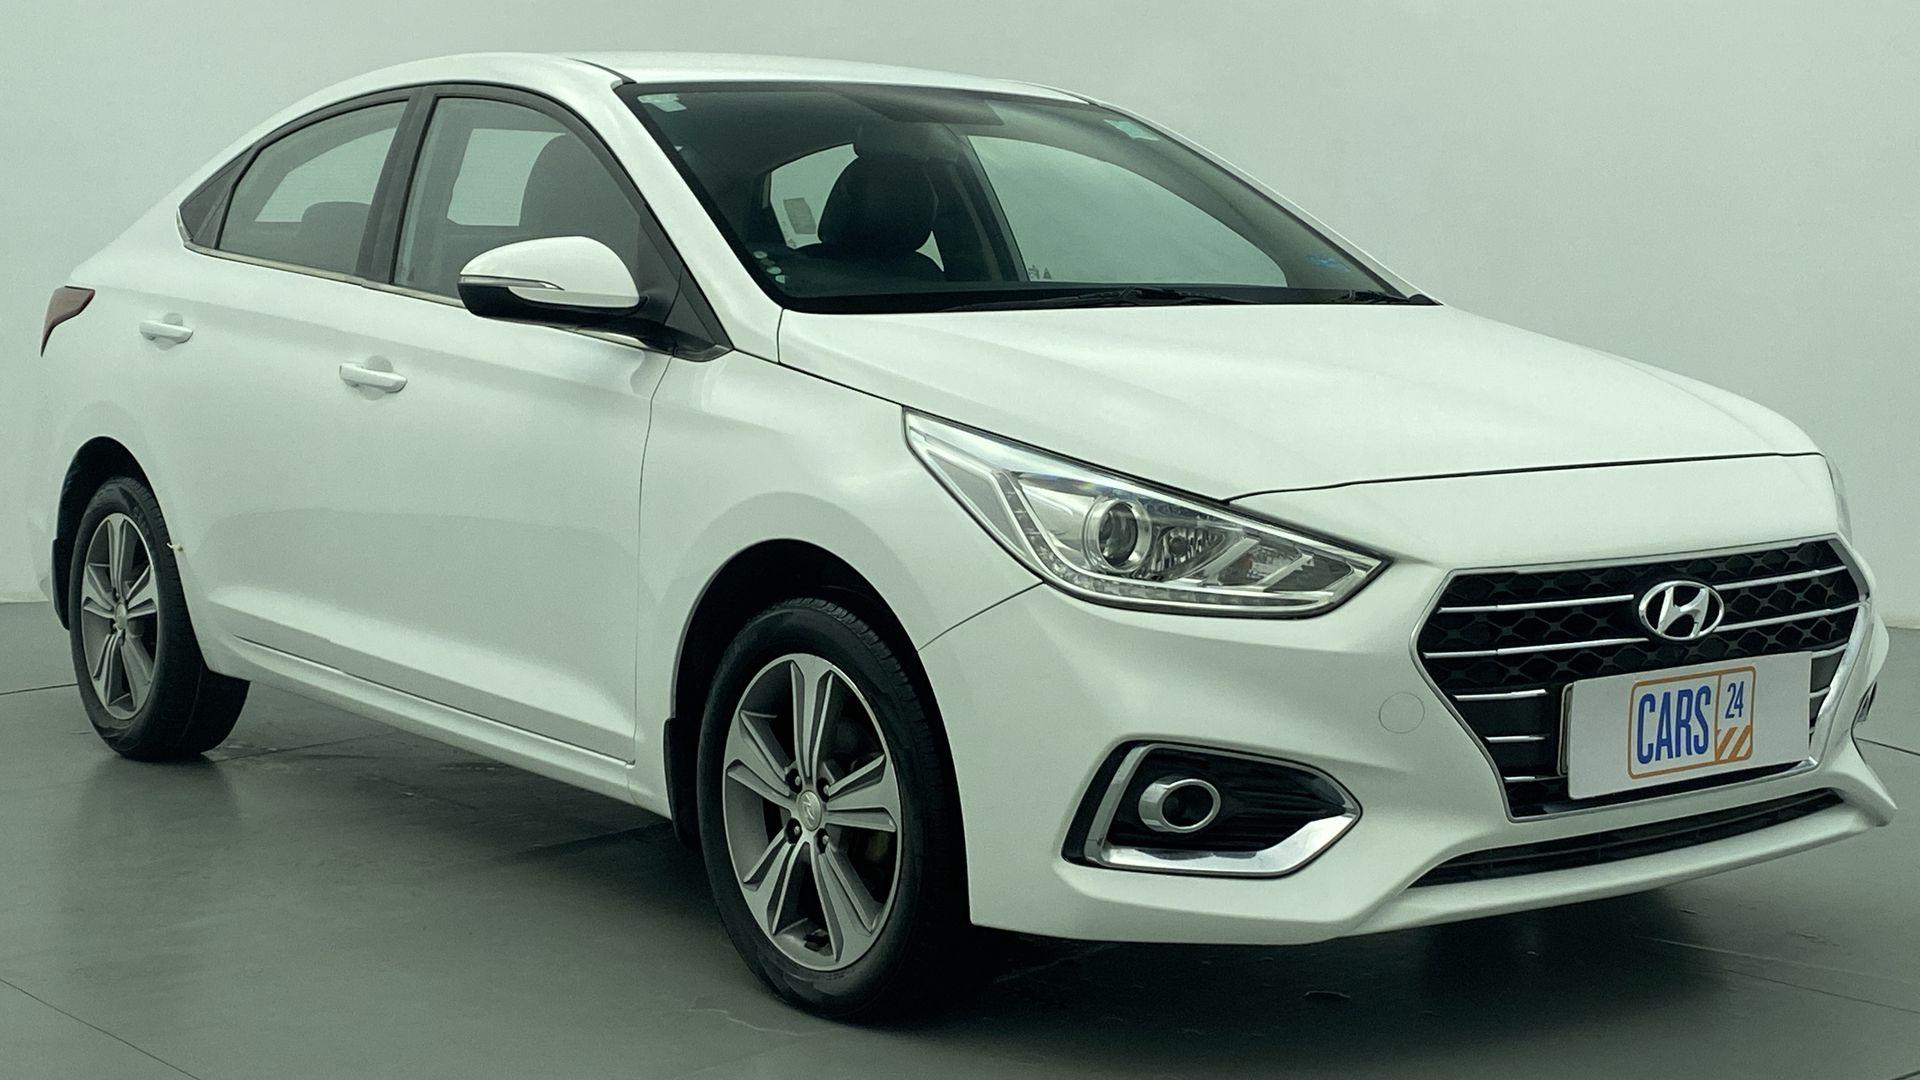 2017 Hyundai Verna 1.6 SX VTVT